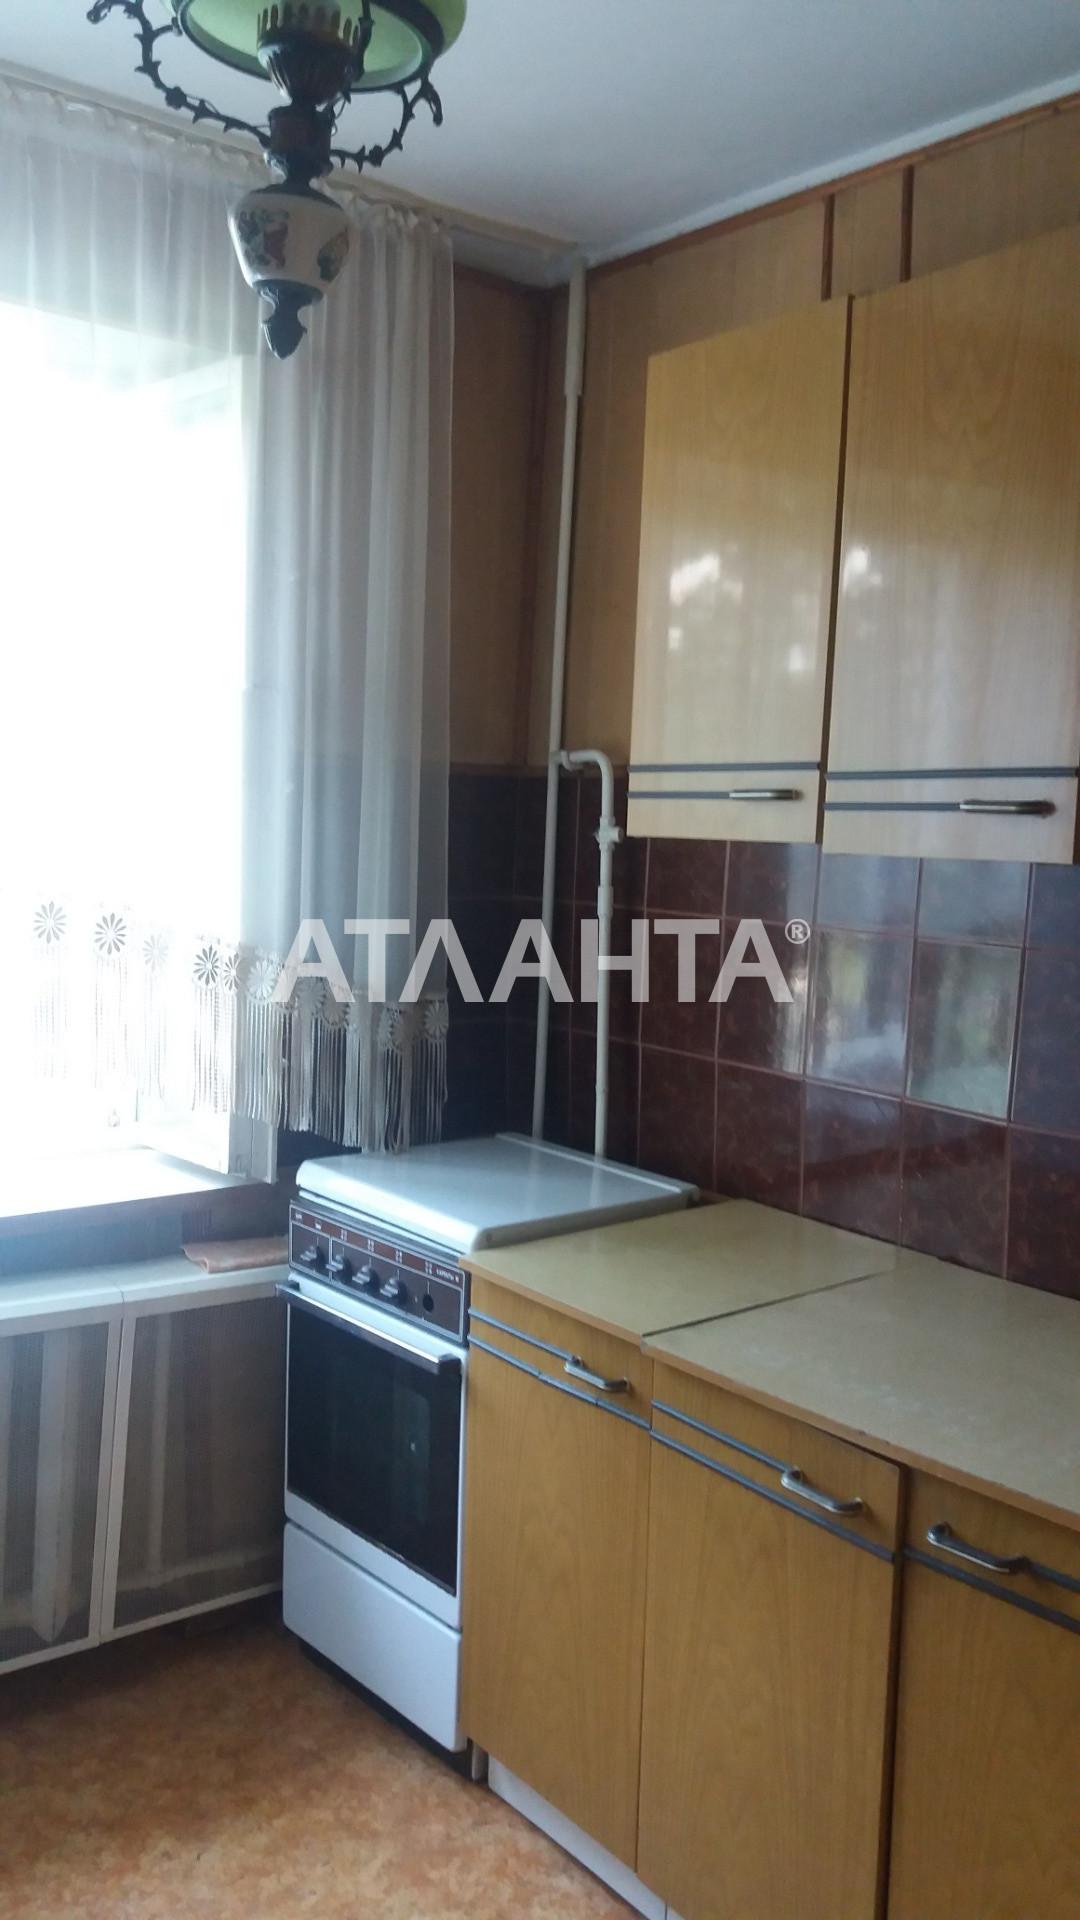 Продается 1-комнатная Квартира на ул. Александрийская — 29 000 у.е.